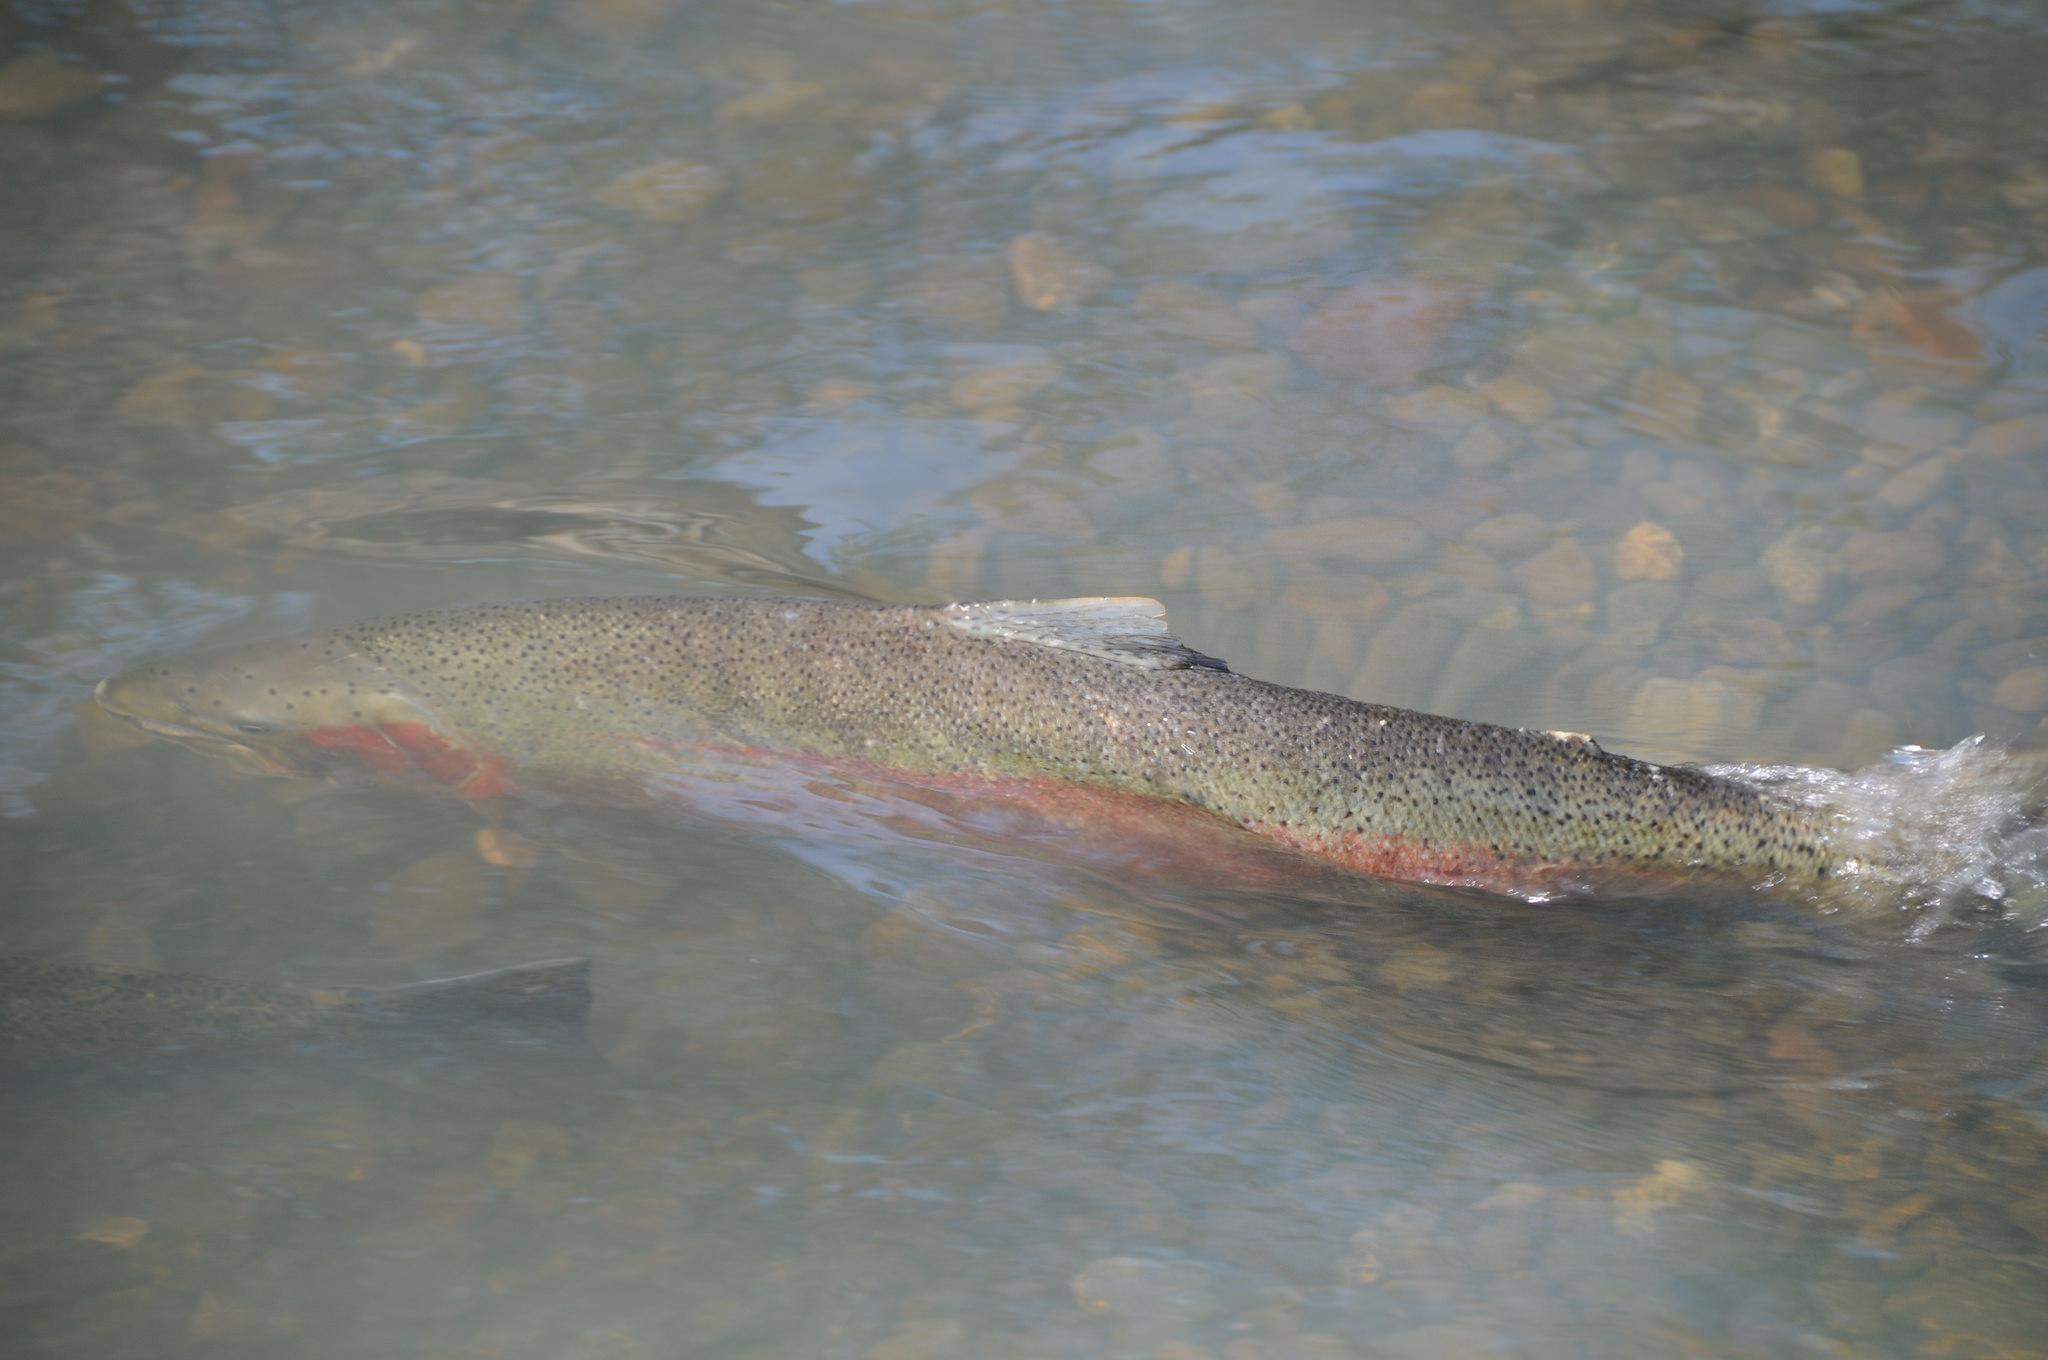 Hood canal steelhead project long live the kings for Hood river fishing